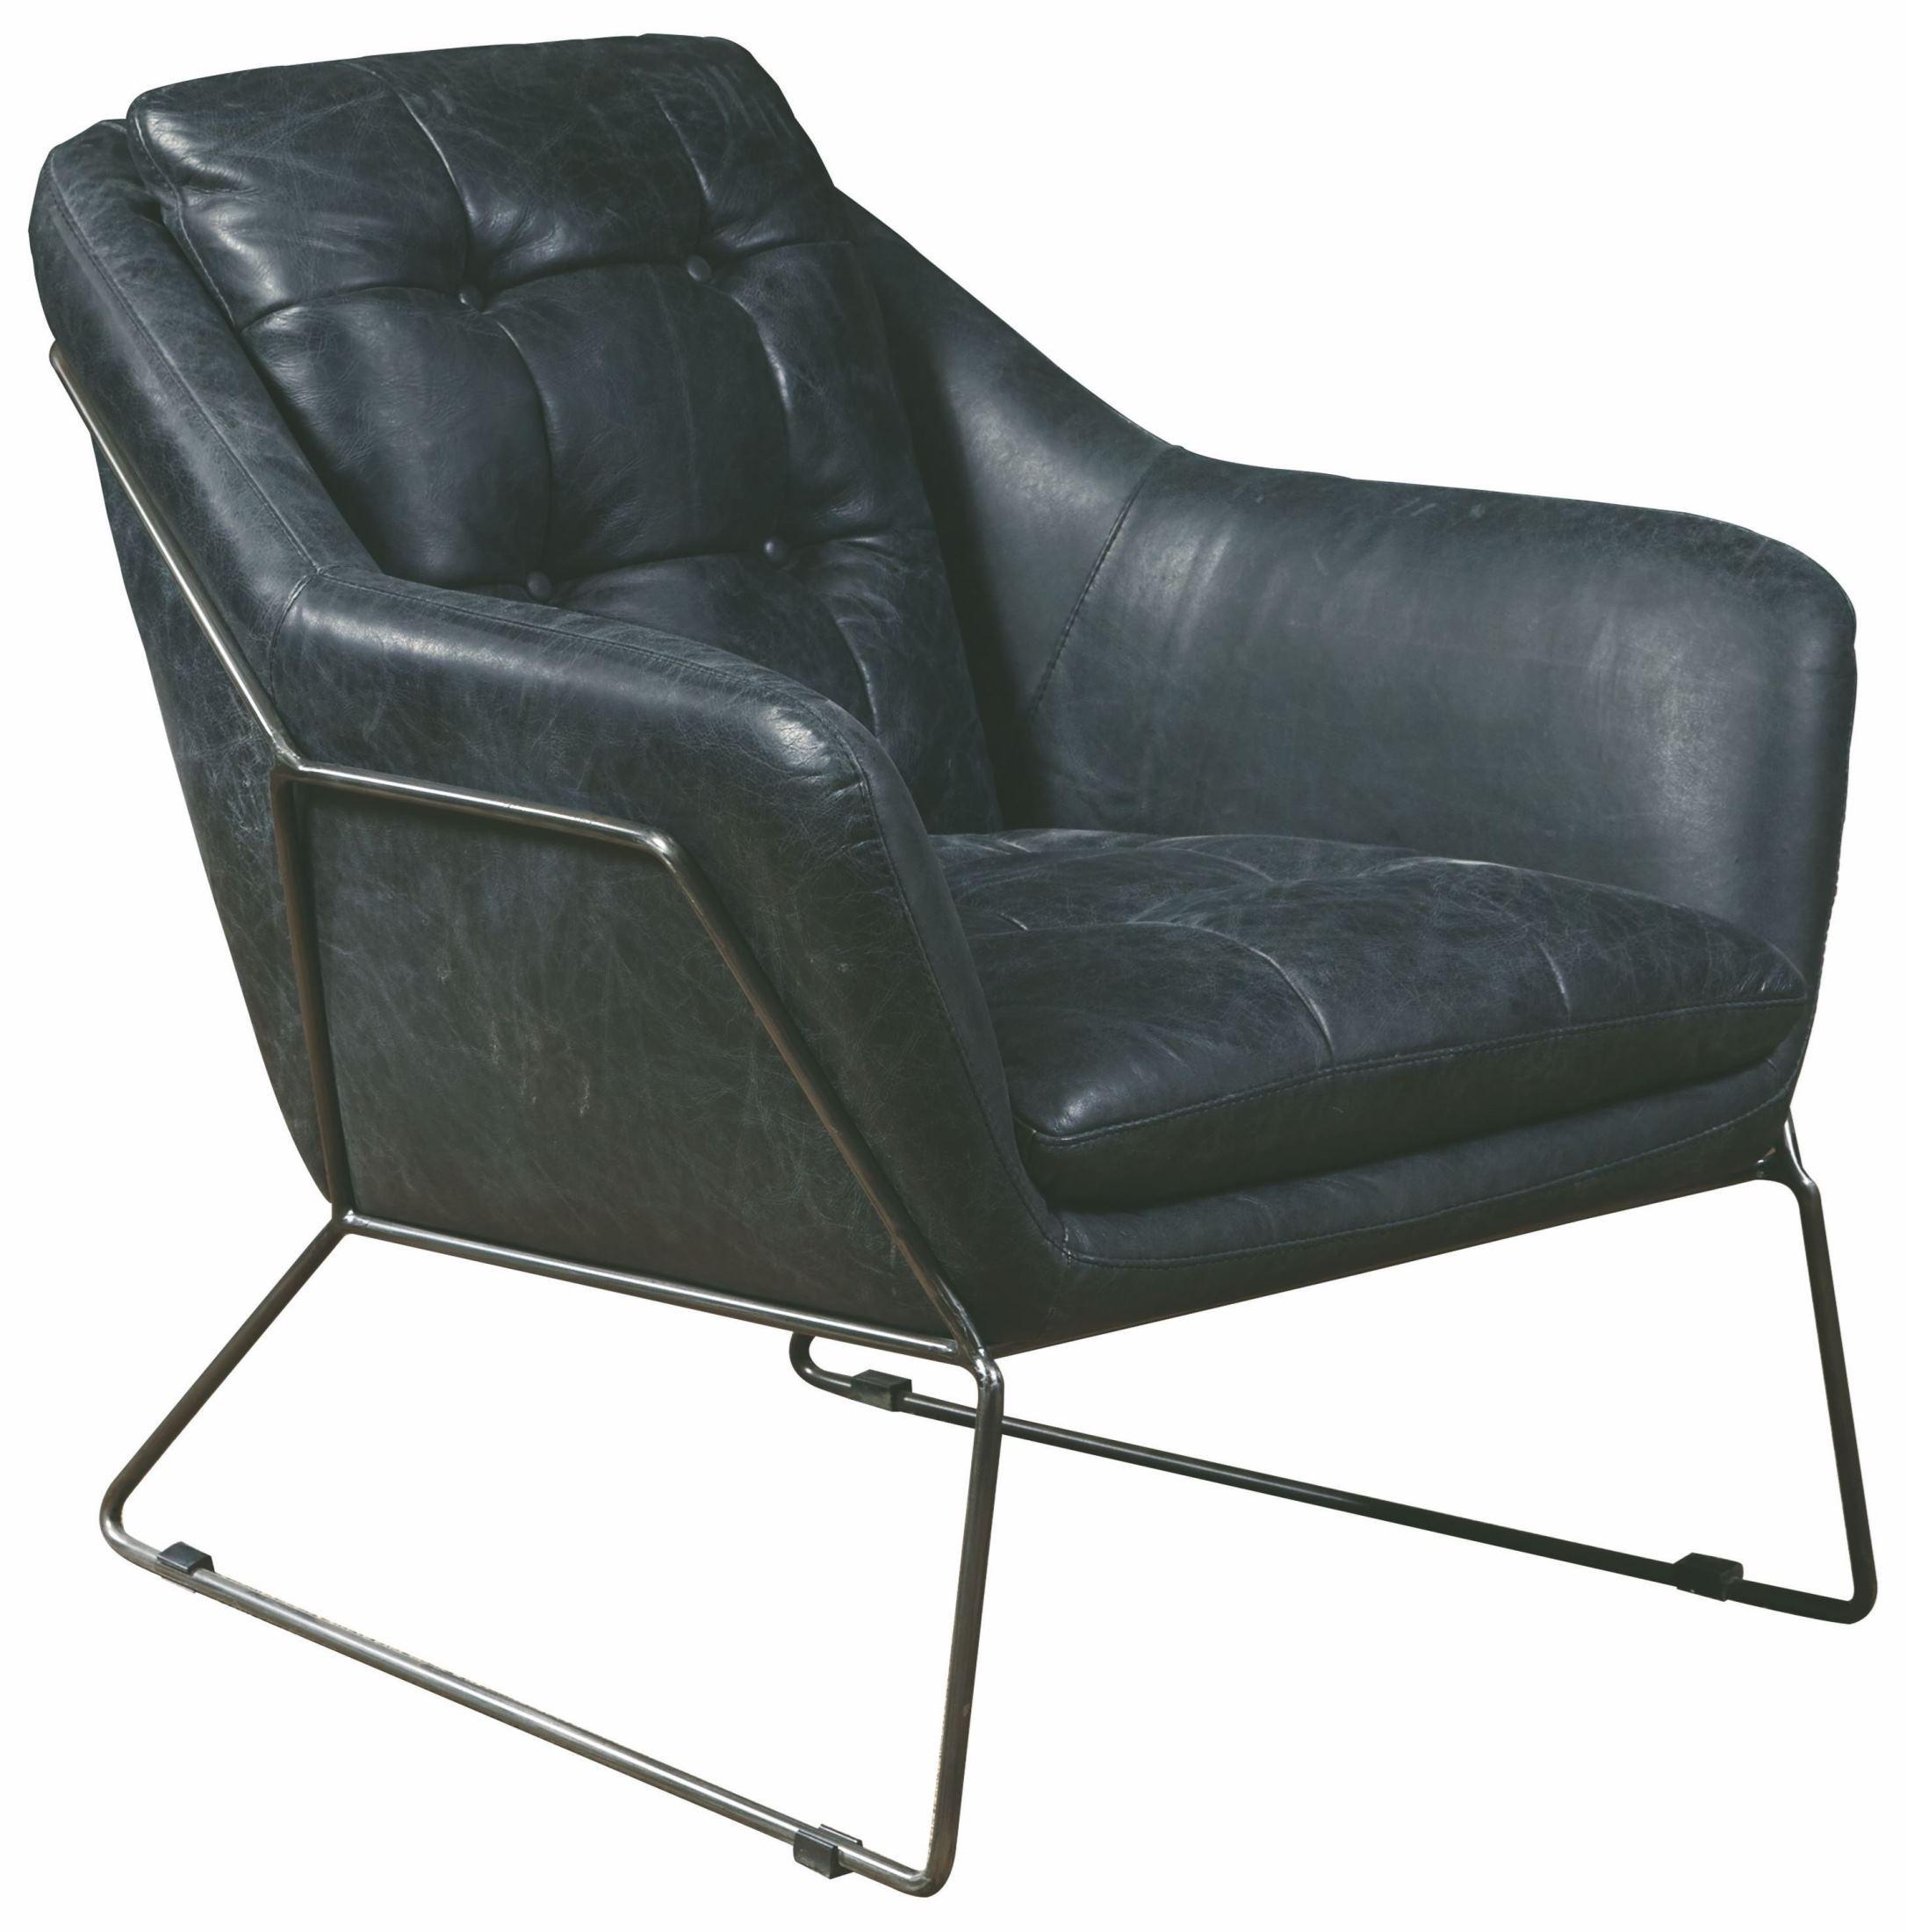 Marina Black Leather Accent Chair P006202 Pulaski